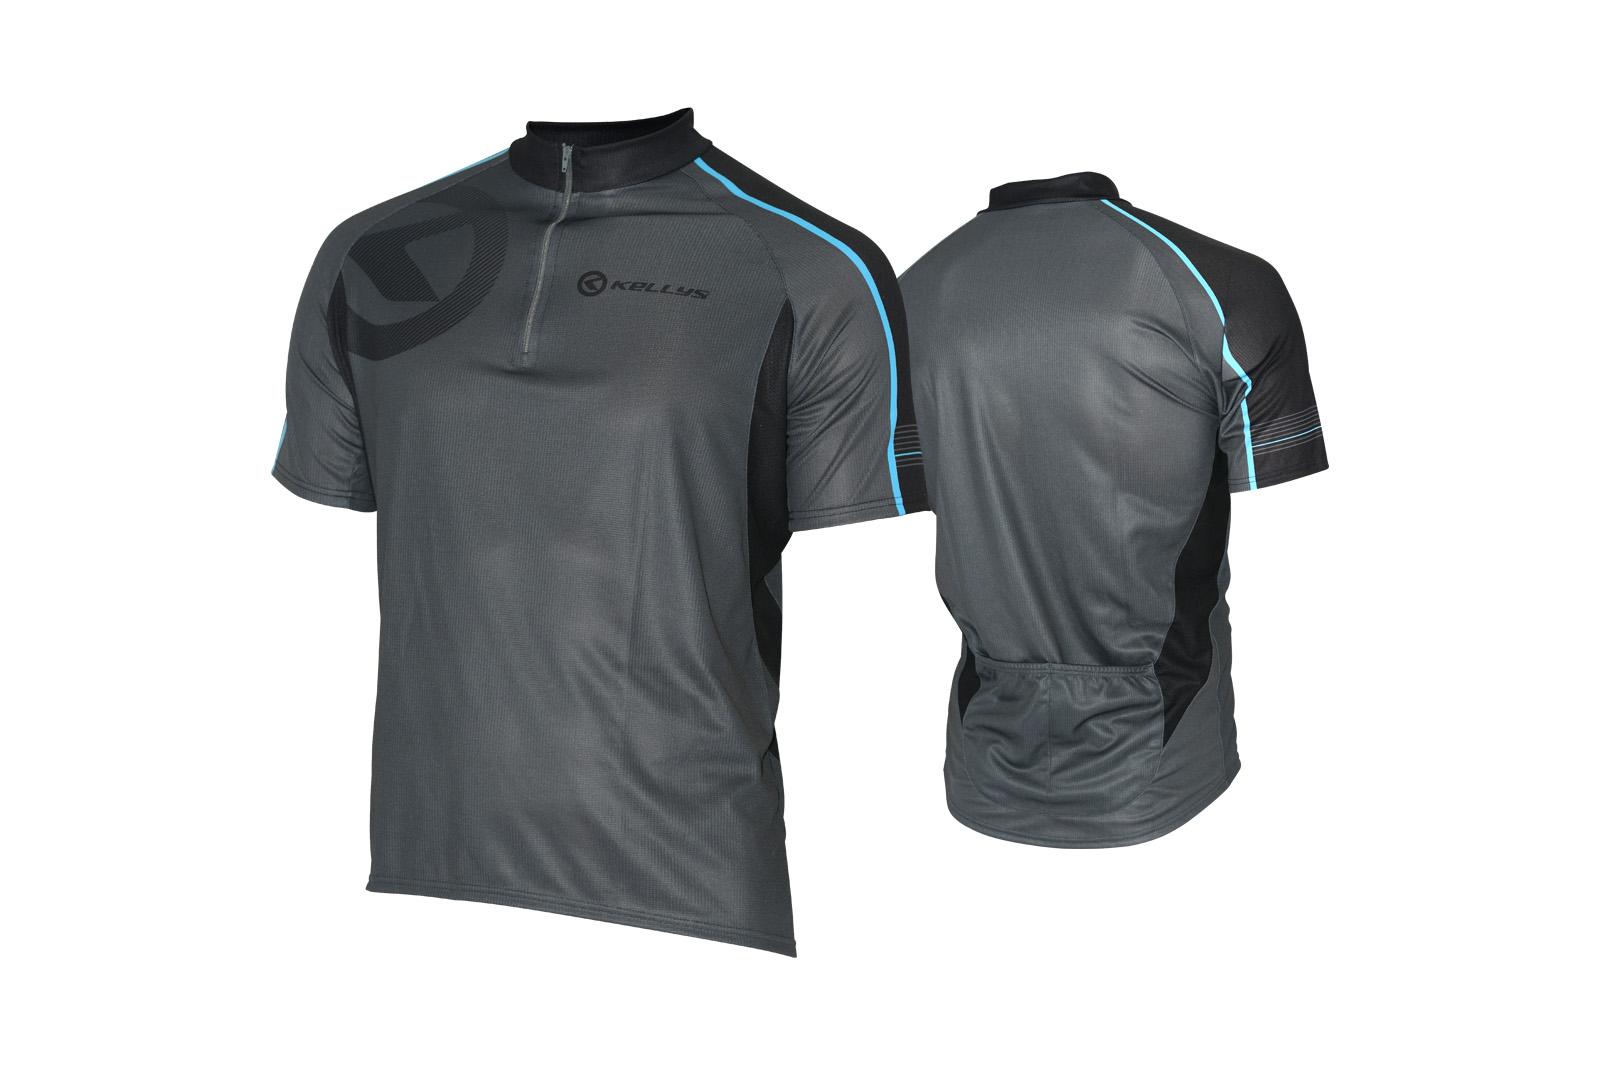 Pánský dres KELLYS PRO Sport, vel. XL, šedo-modrá, krátký rukáv (Pánský cyklistický dres KELLYS, vel. XL, krátký rukáv, barva šedá/modrá dle vyobrazení!)